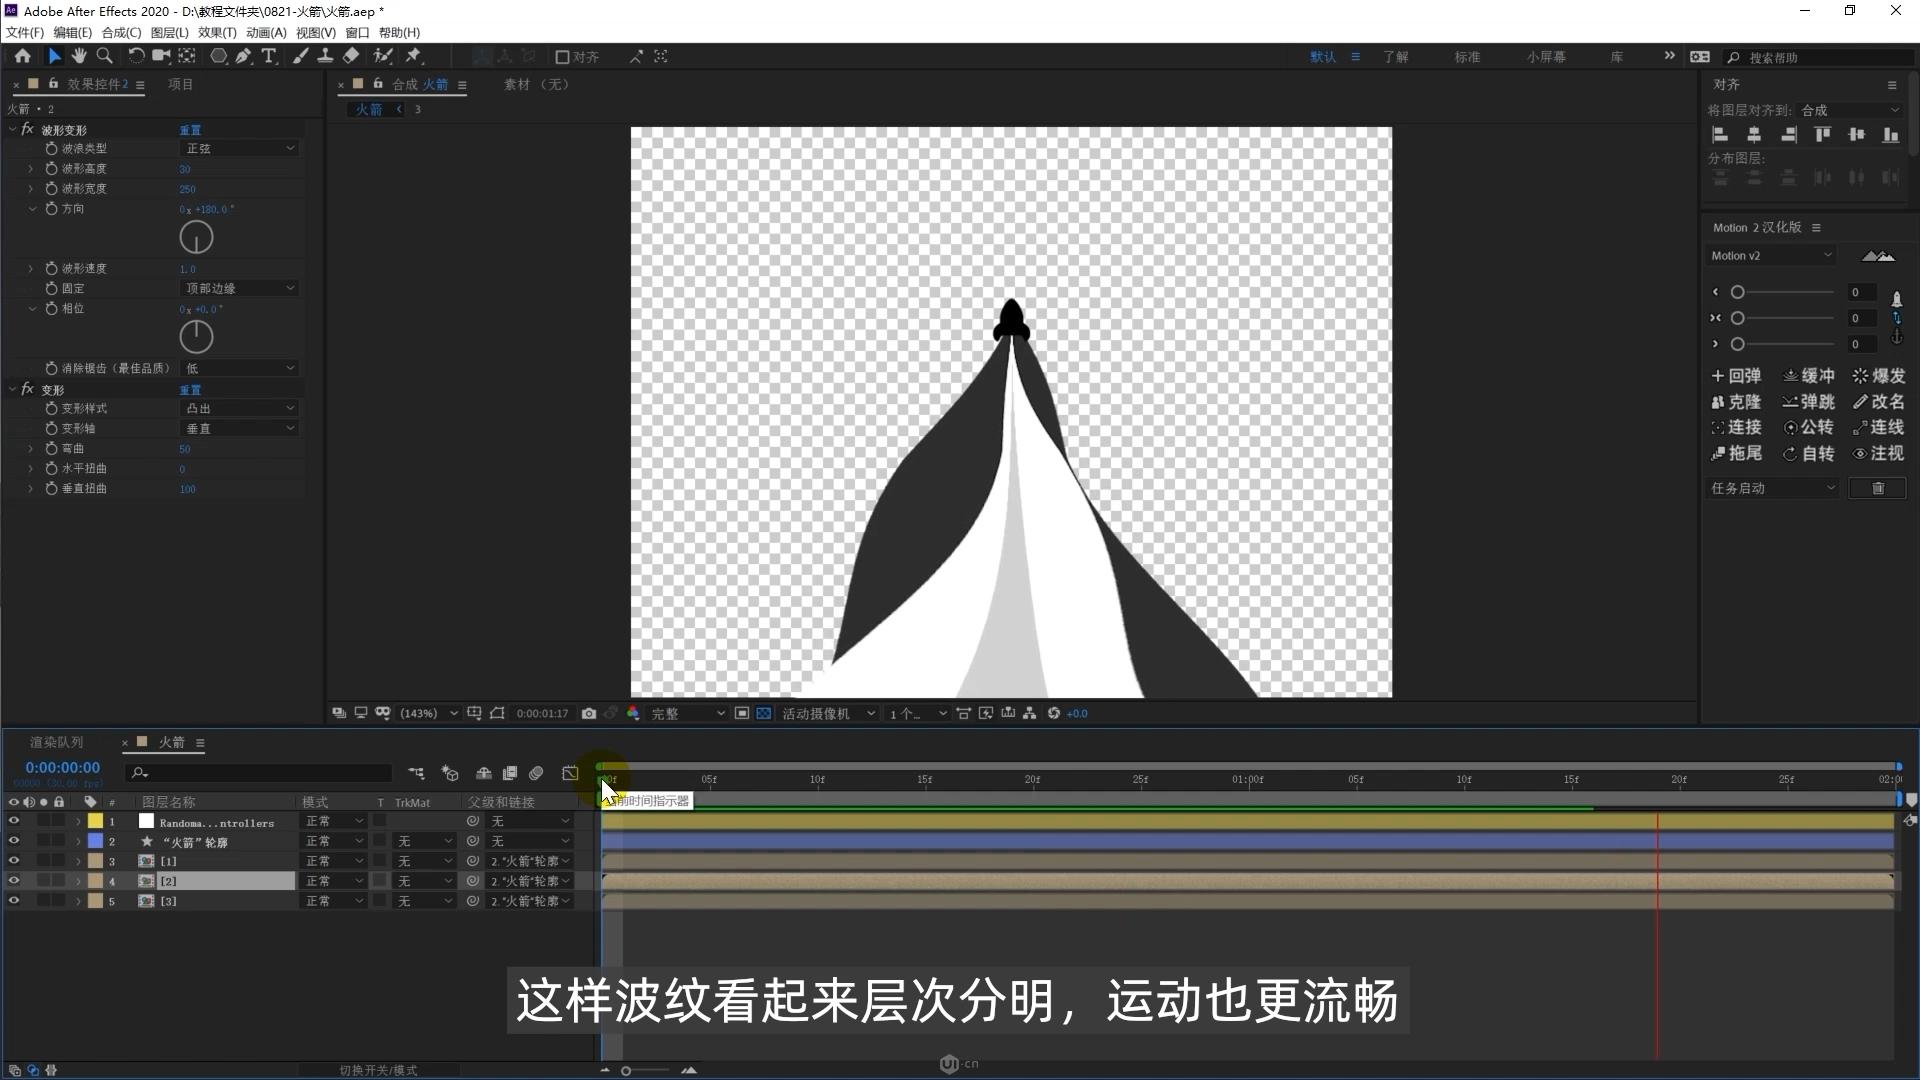 AE如何制作简单的太空旅行MG动画(9)